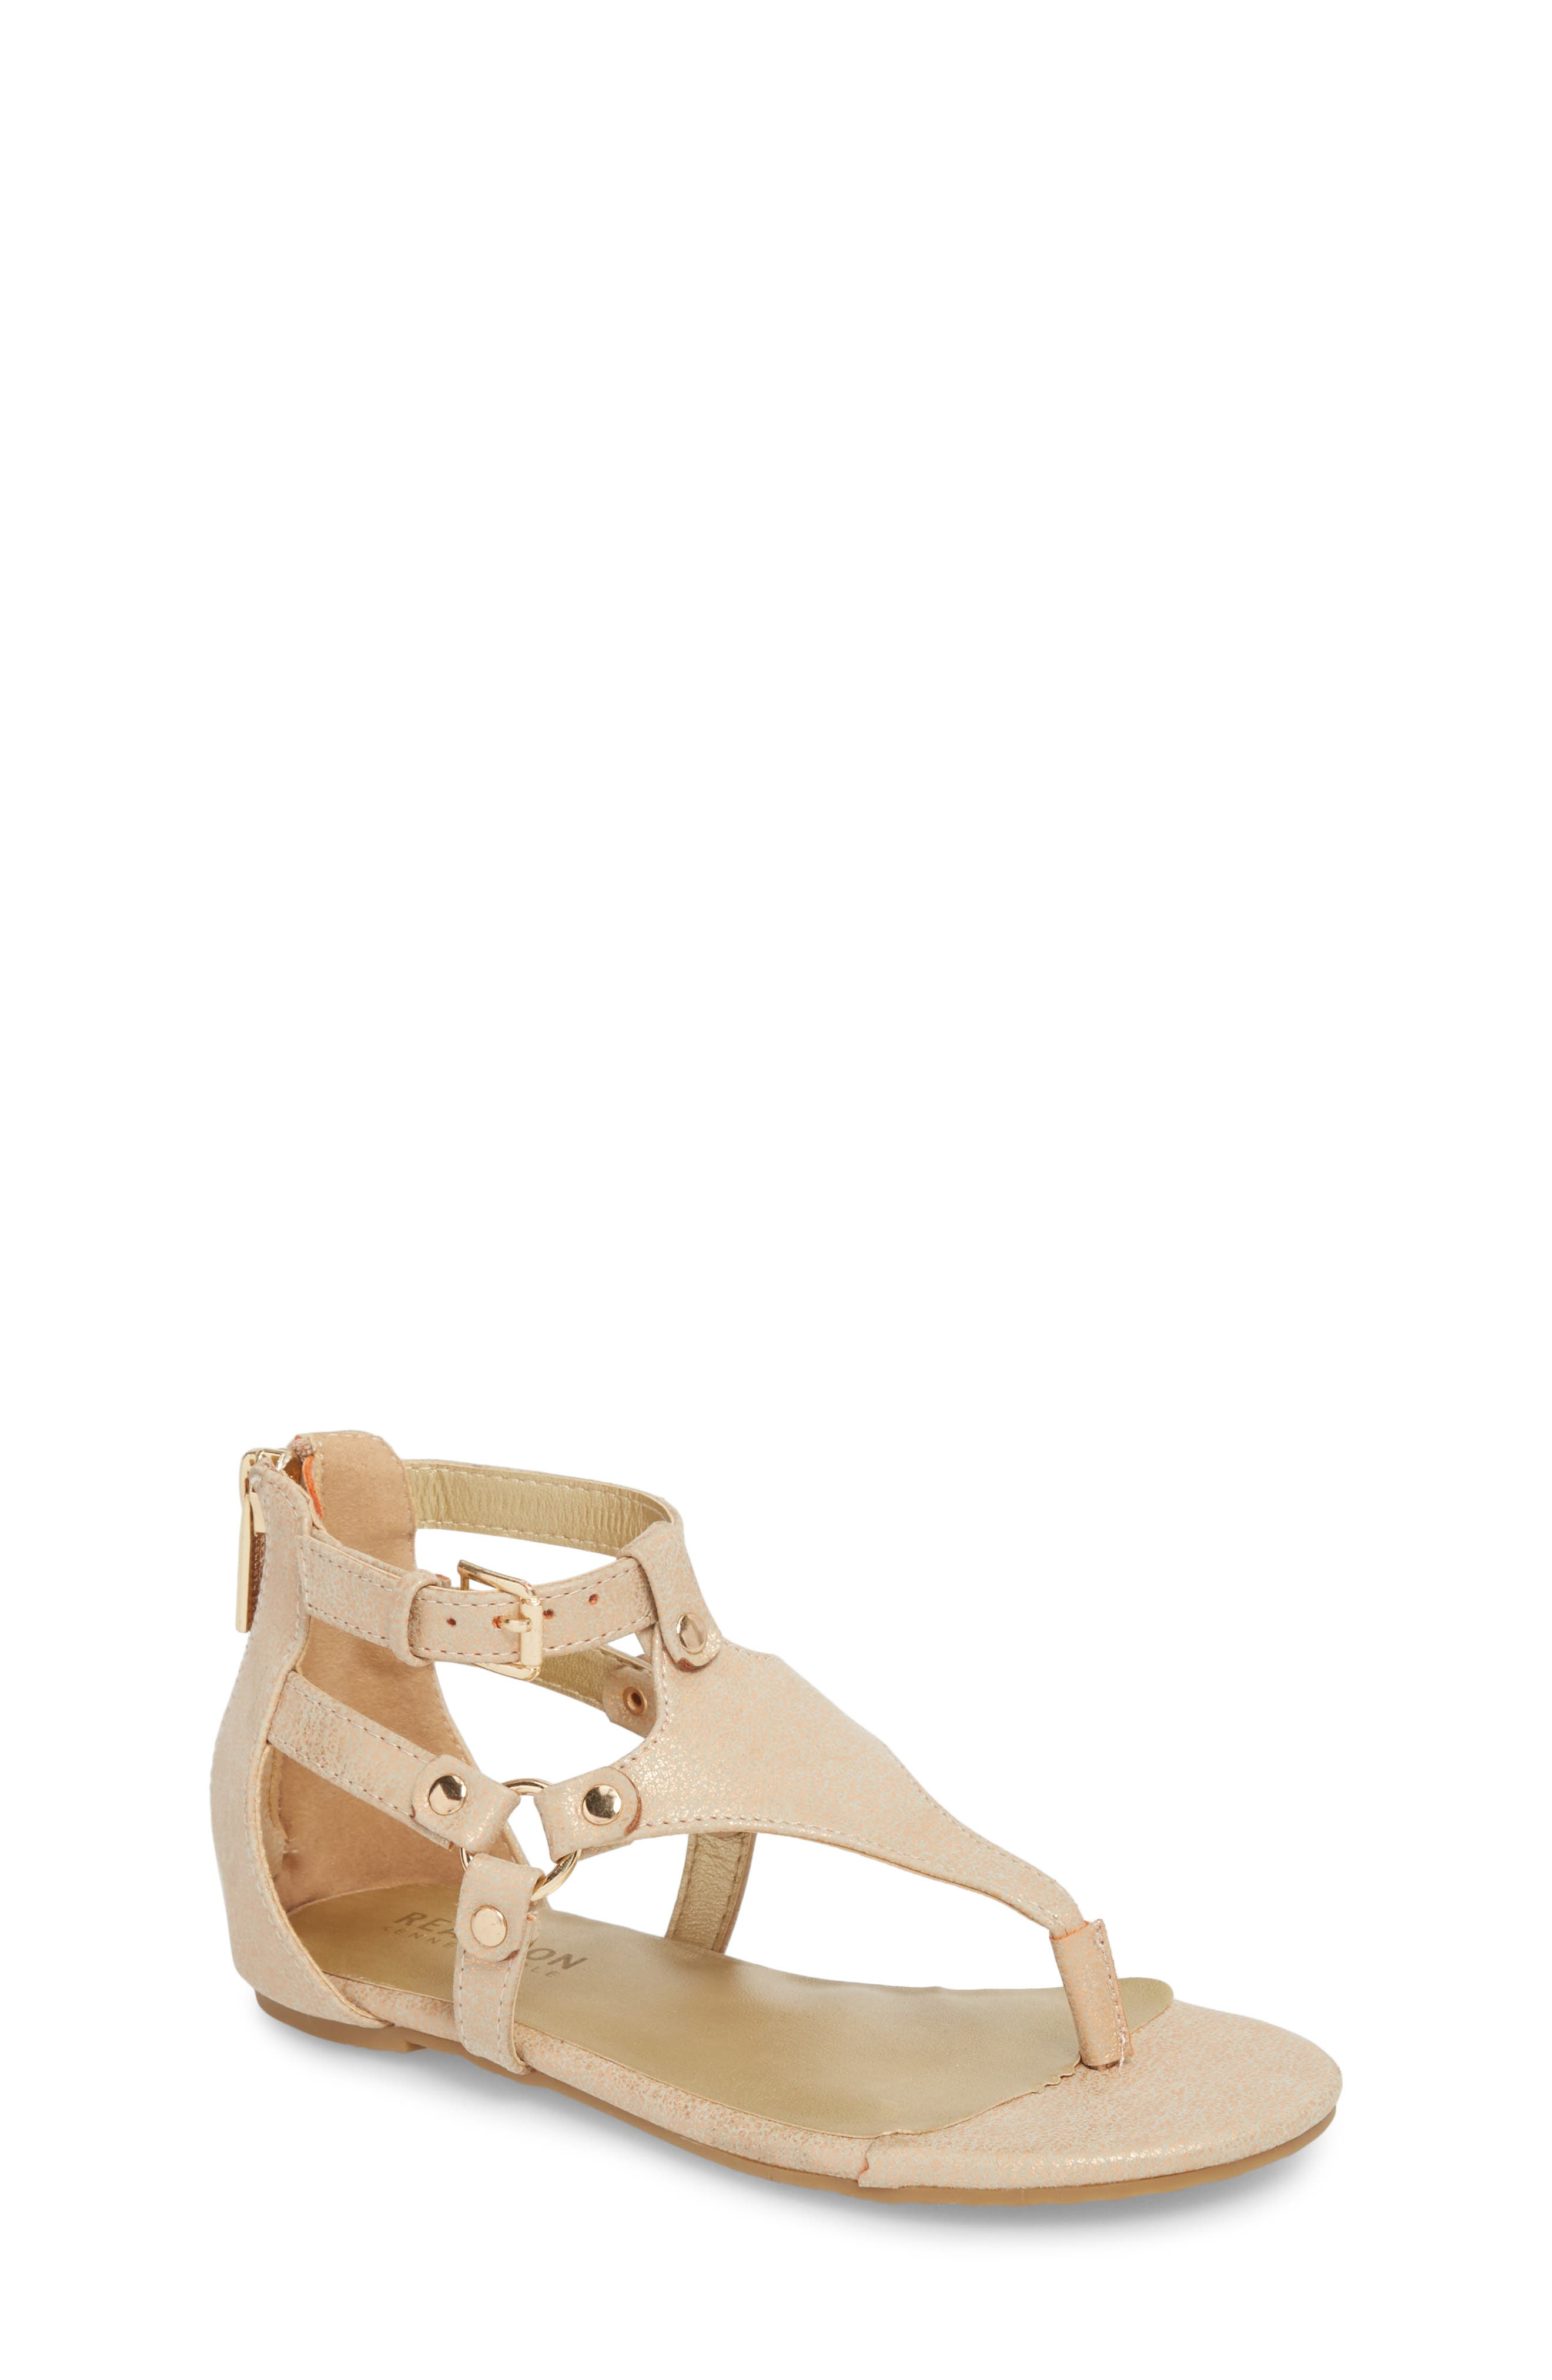 Reaction Kenneth Cole Kiera Metallic Thong Sandal,                         Main,                         color,